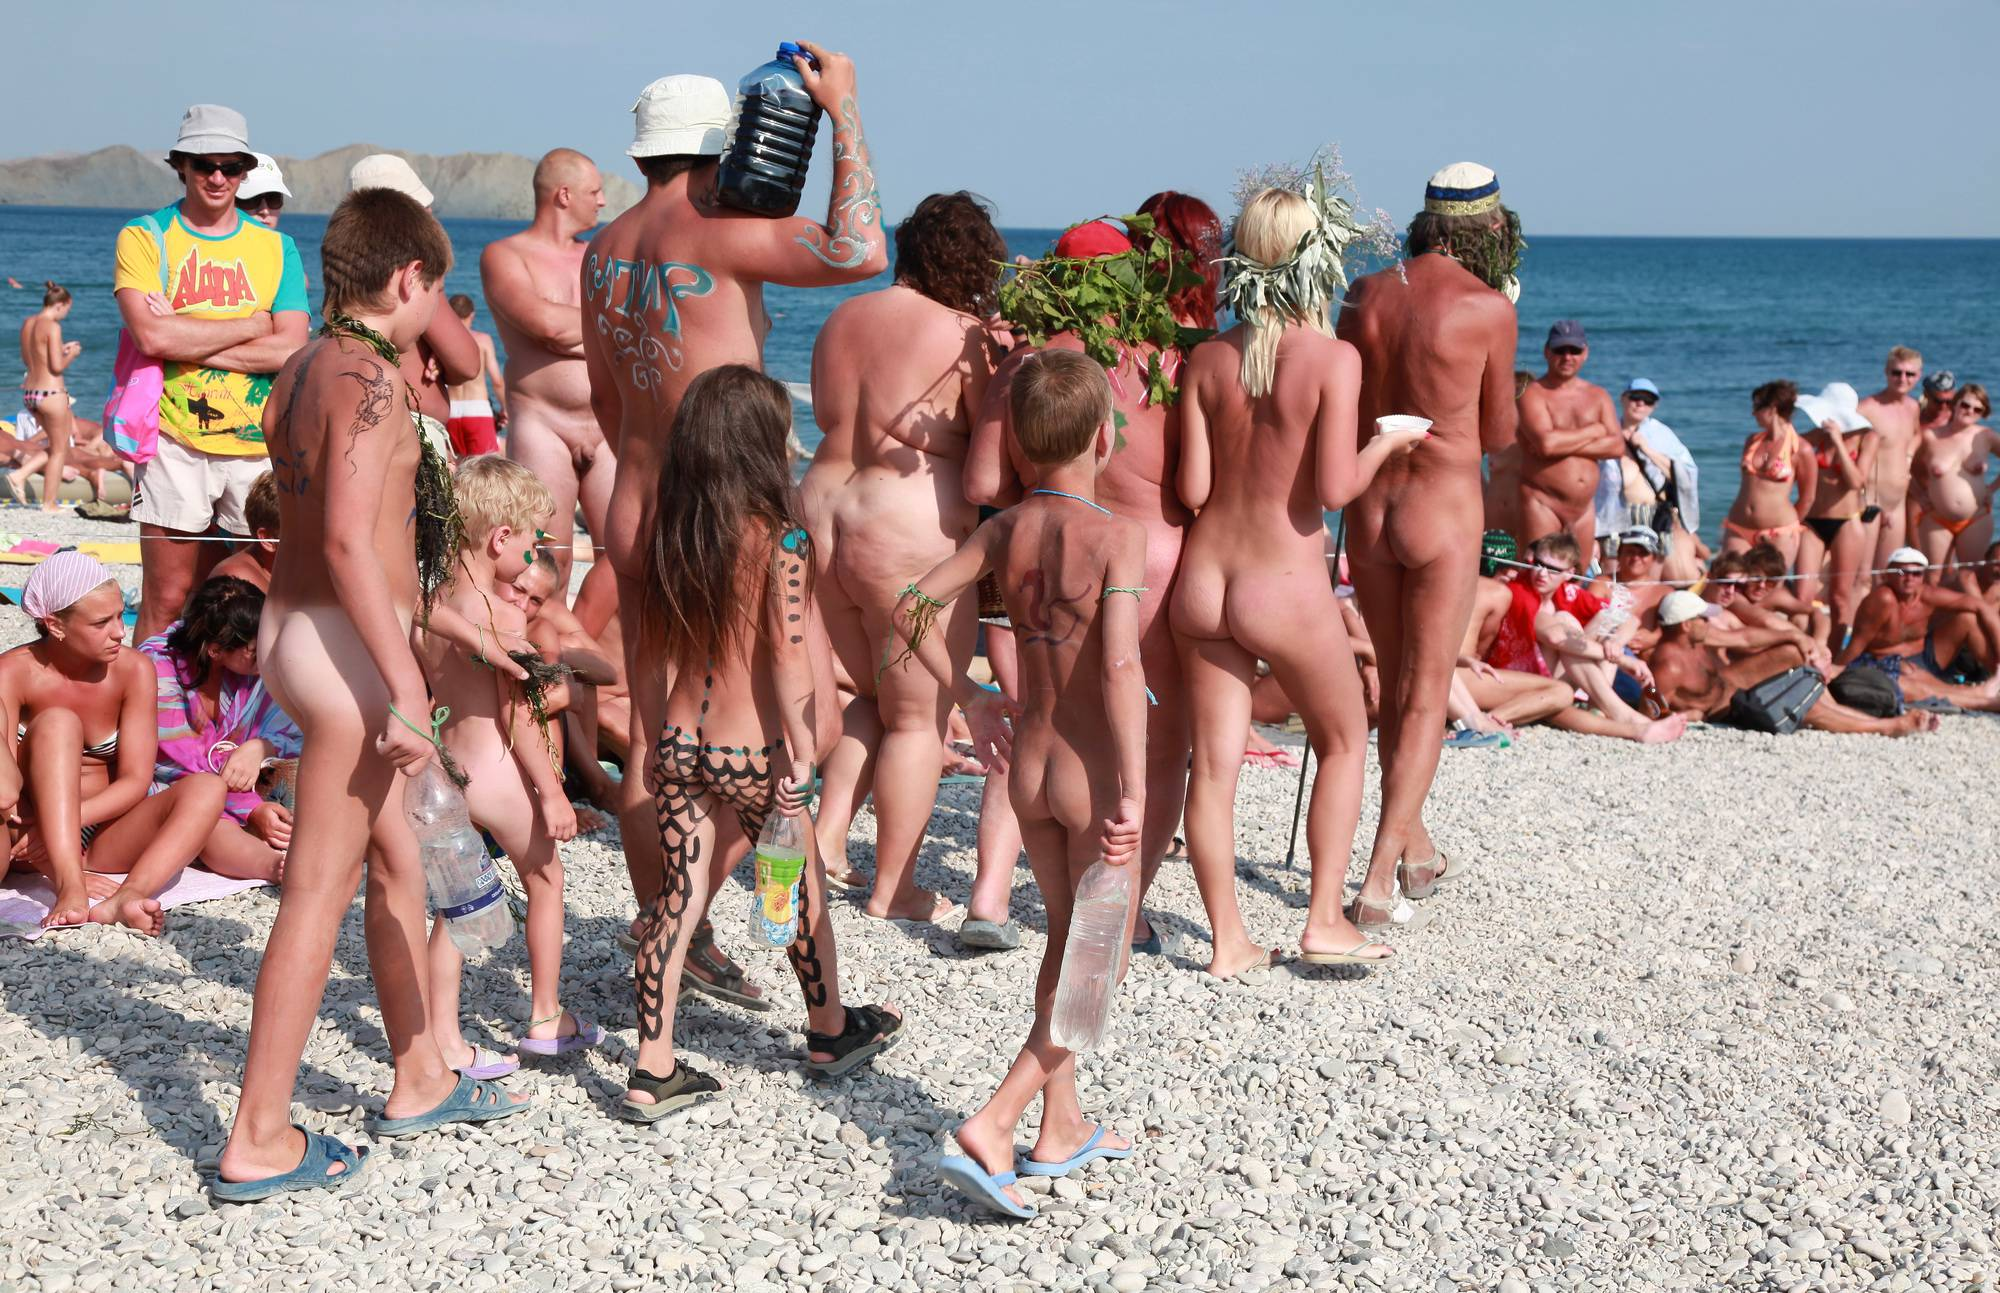 Nudist Gallery Nude Group Presentation - 1